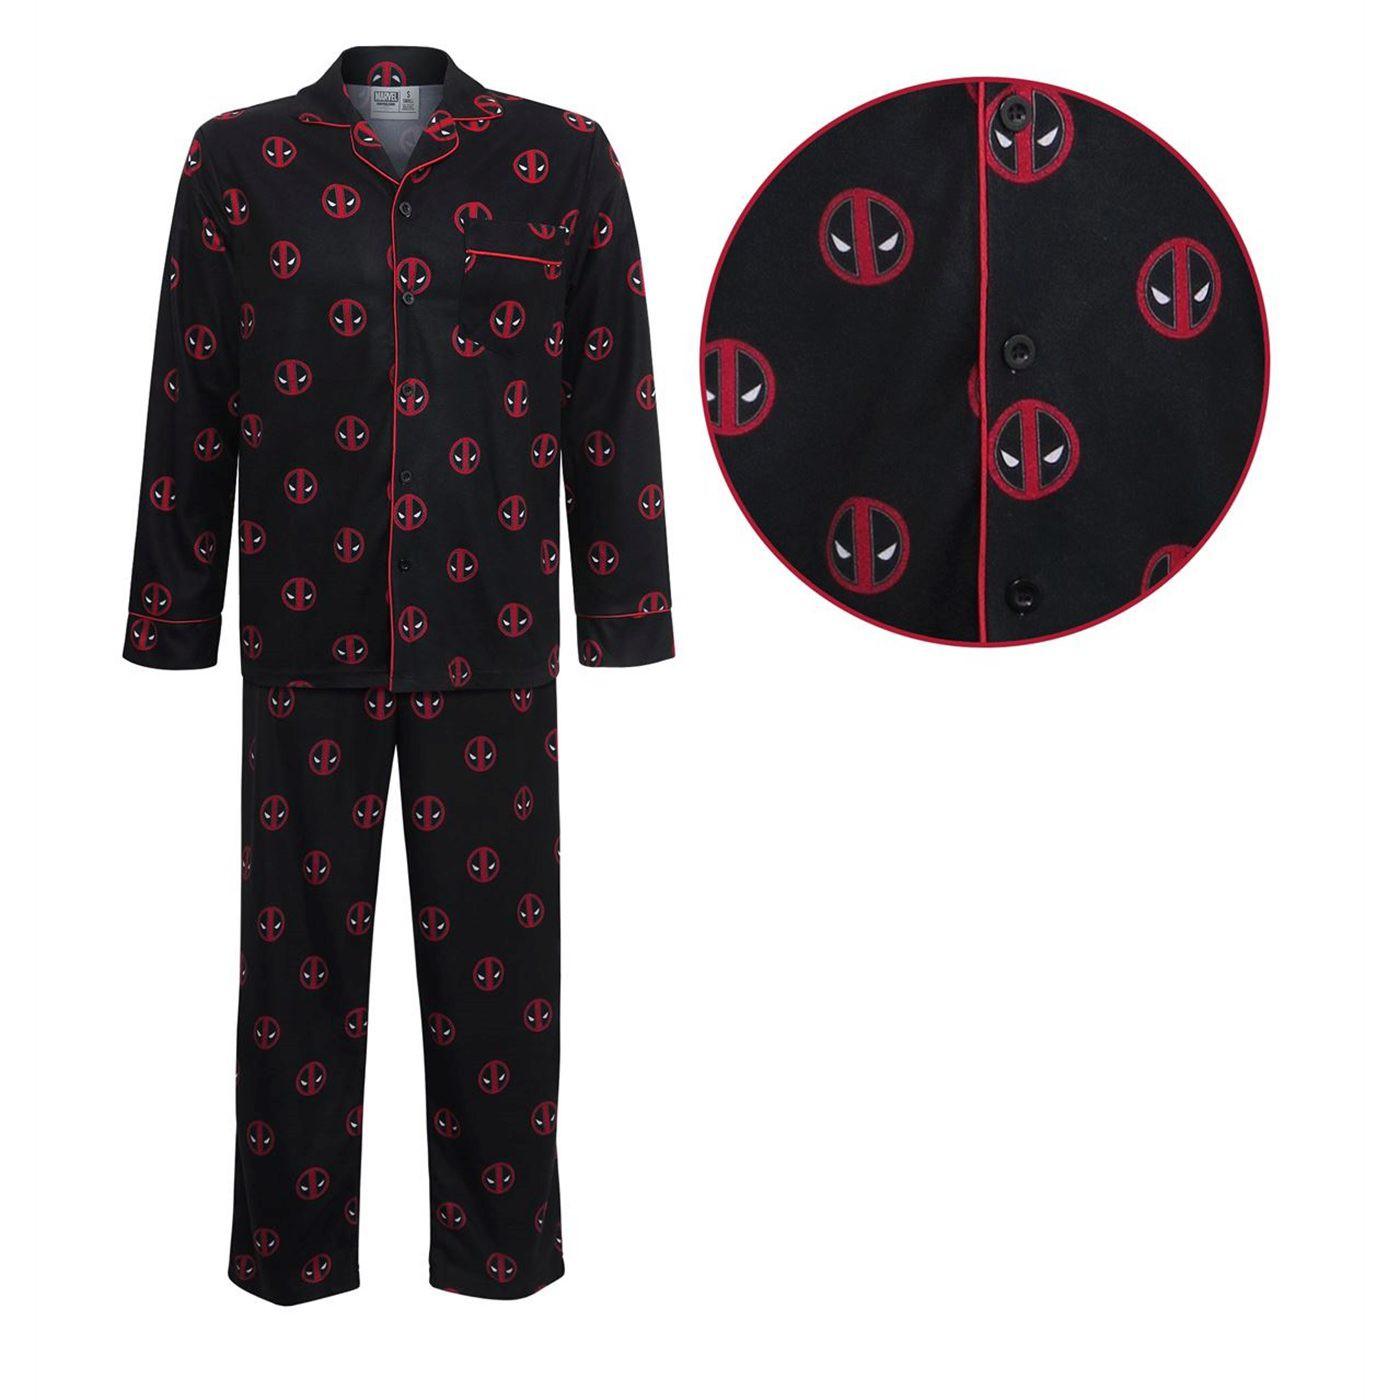 Deadpool All-Over Print Pajama Set